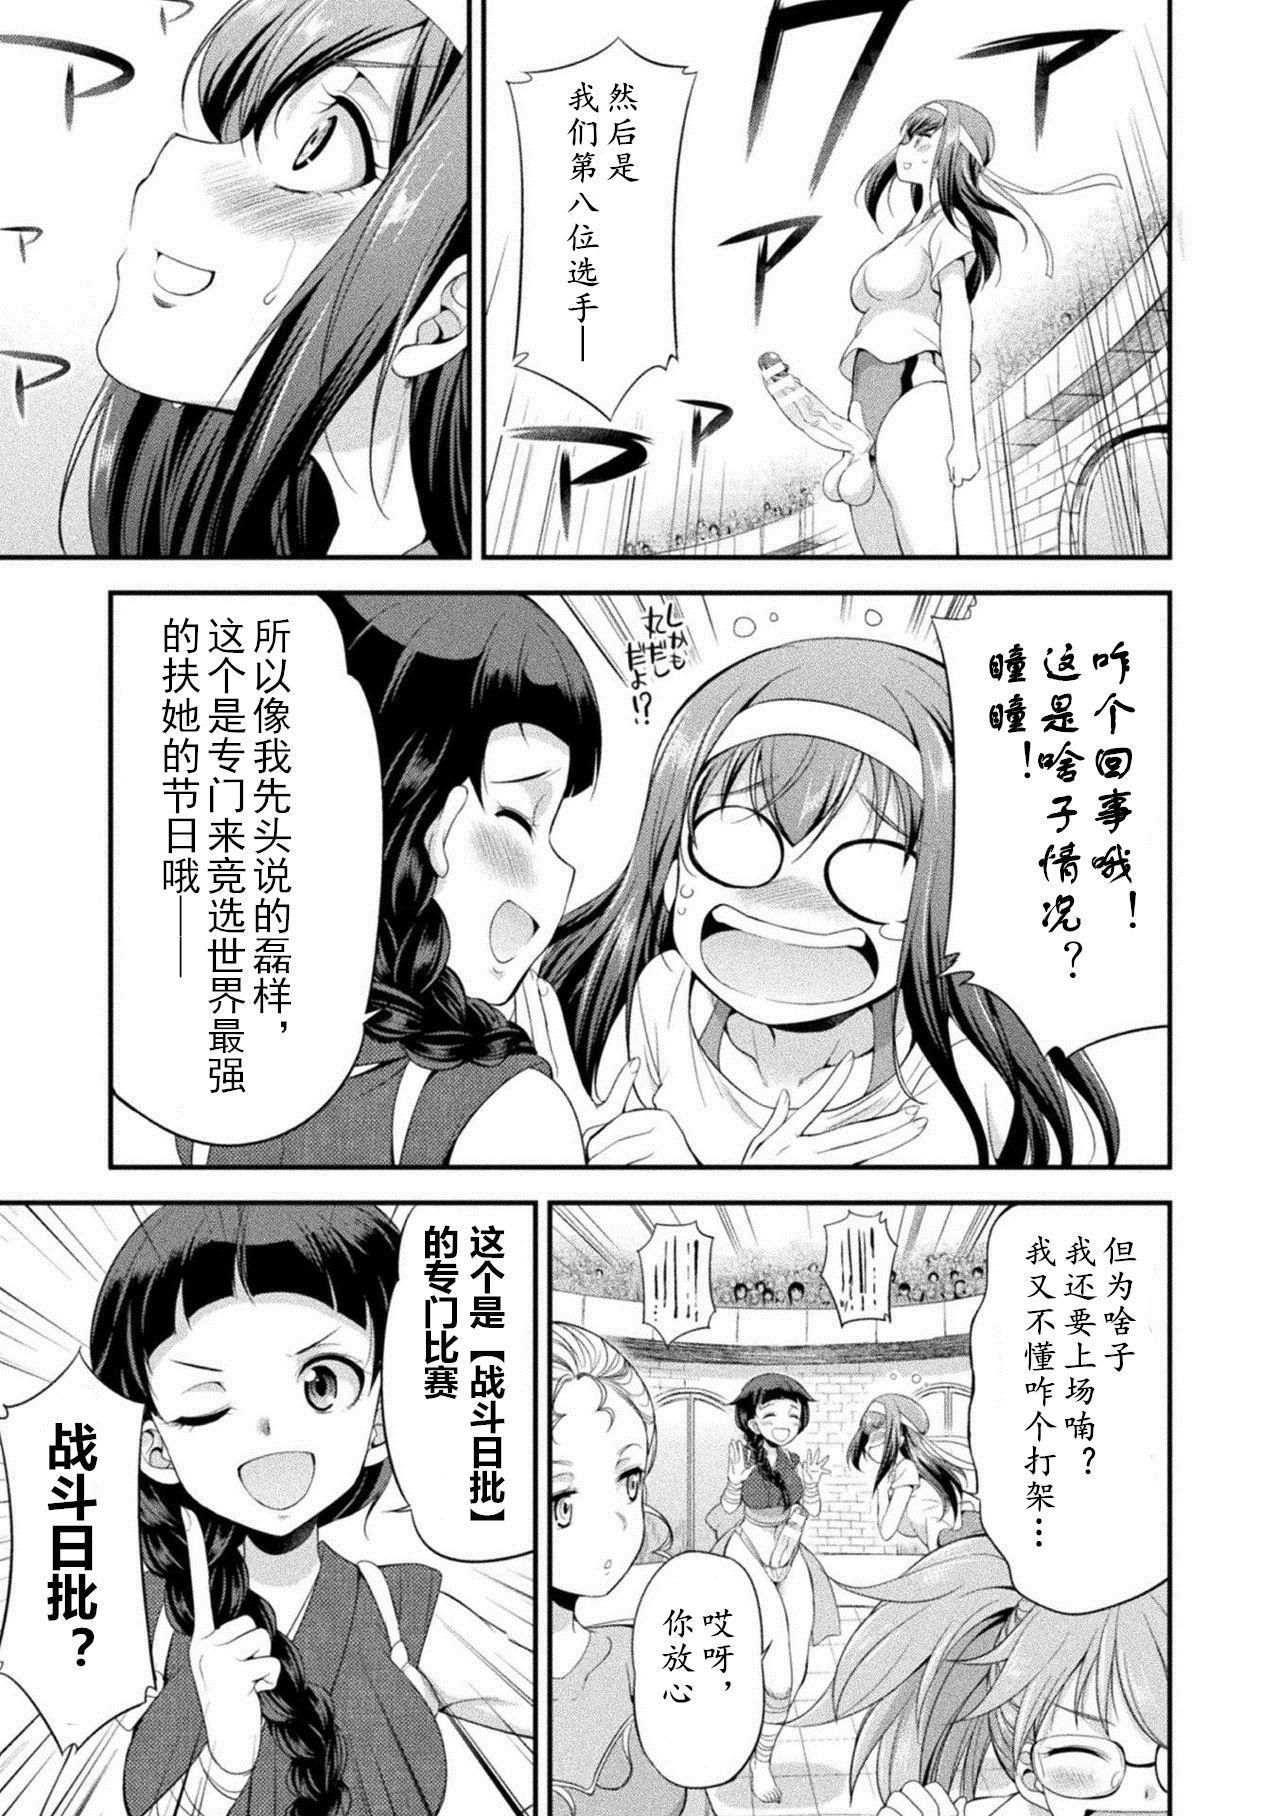 [Kaguya] Futanarijima ~The Queen of Penis~Ch. 1 [Chinese] [鬼迷日眼的莱科少校个人川话化] 21